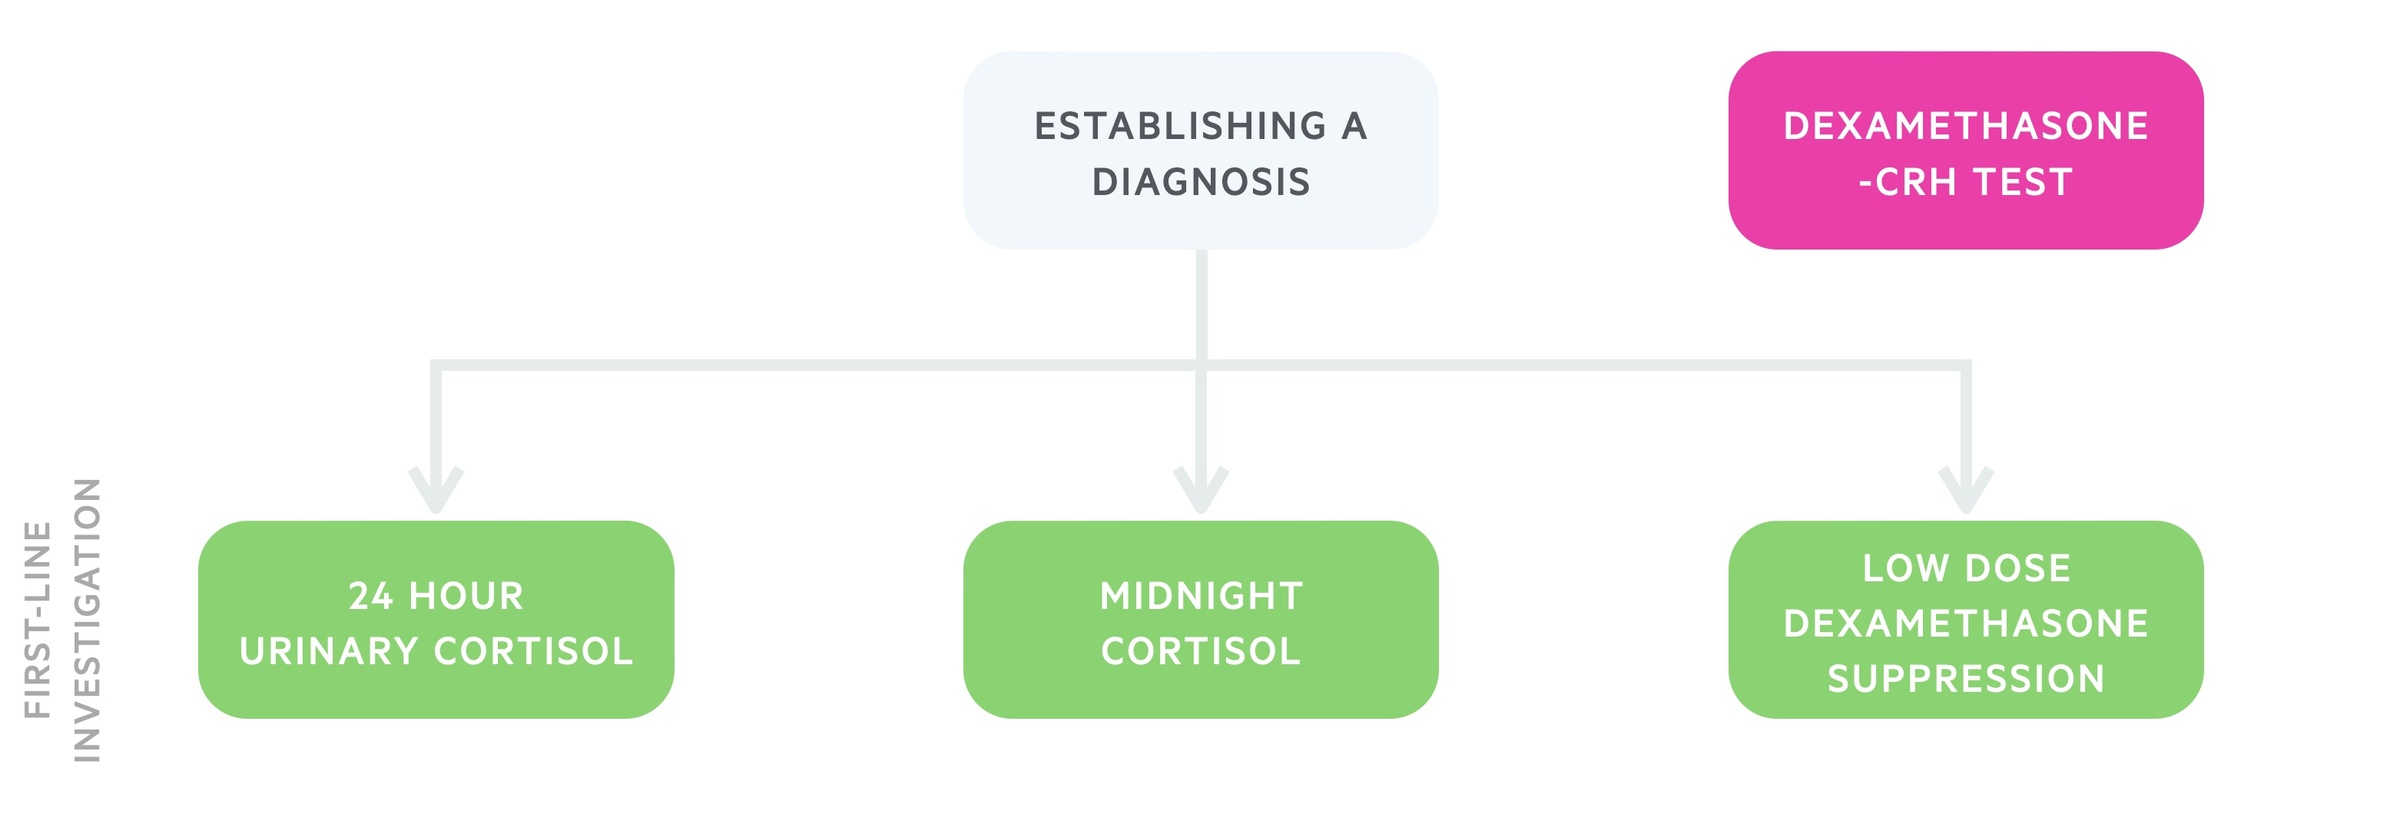 Establishing a diagnosis of Cushing's syndrome